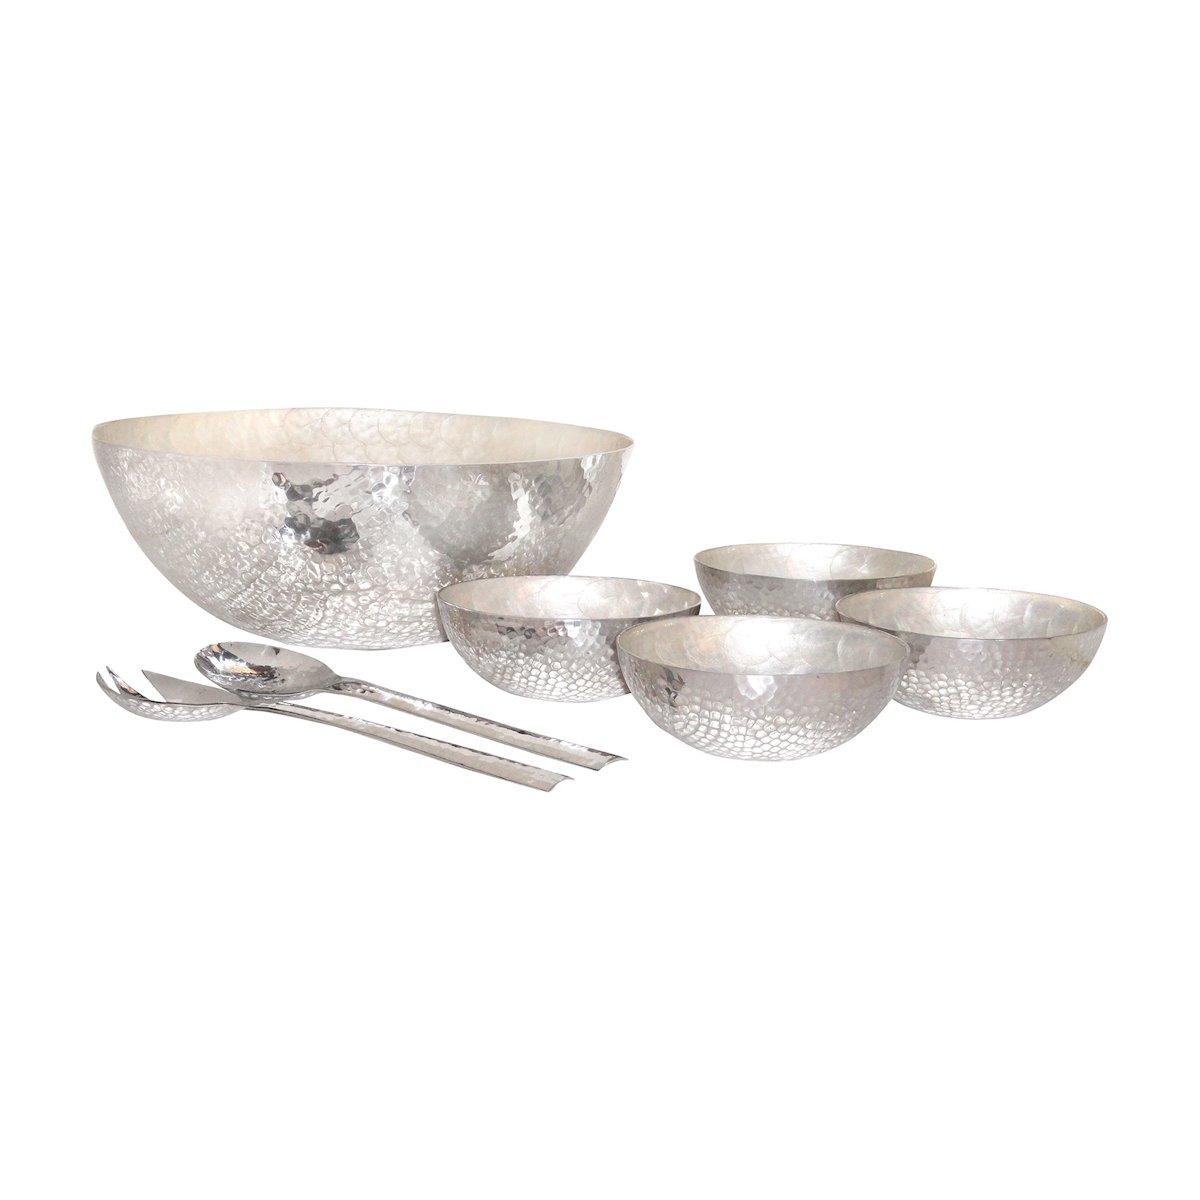 Pomeroy Reef Salad Set, Hammered Aluminum/Pearl